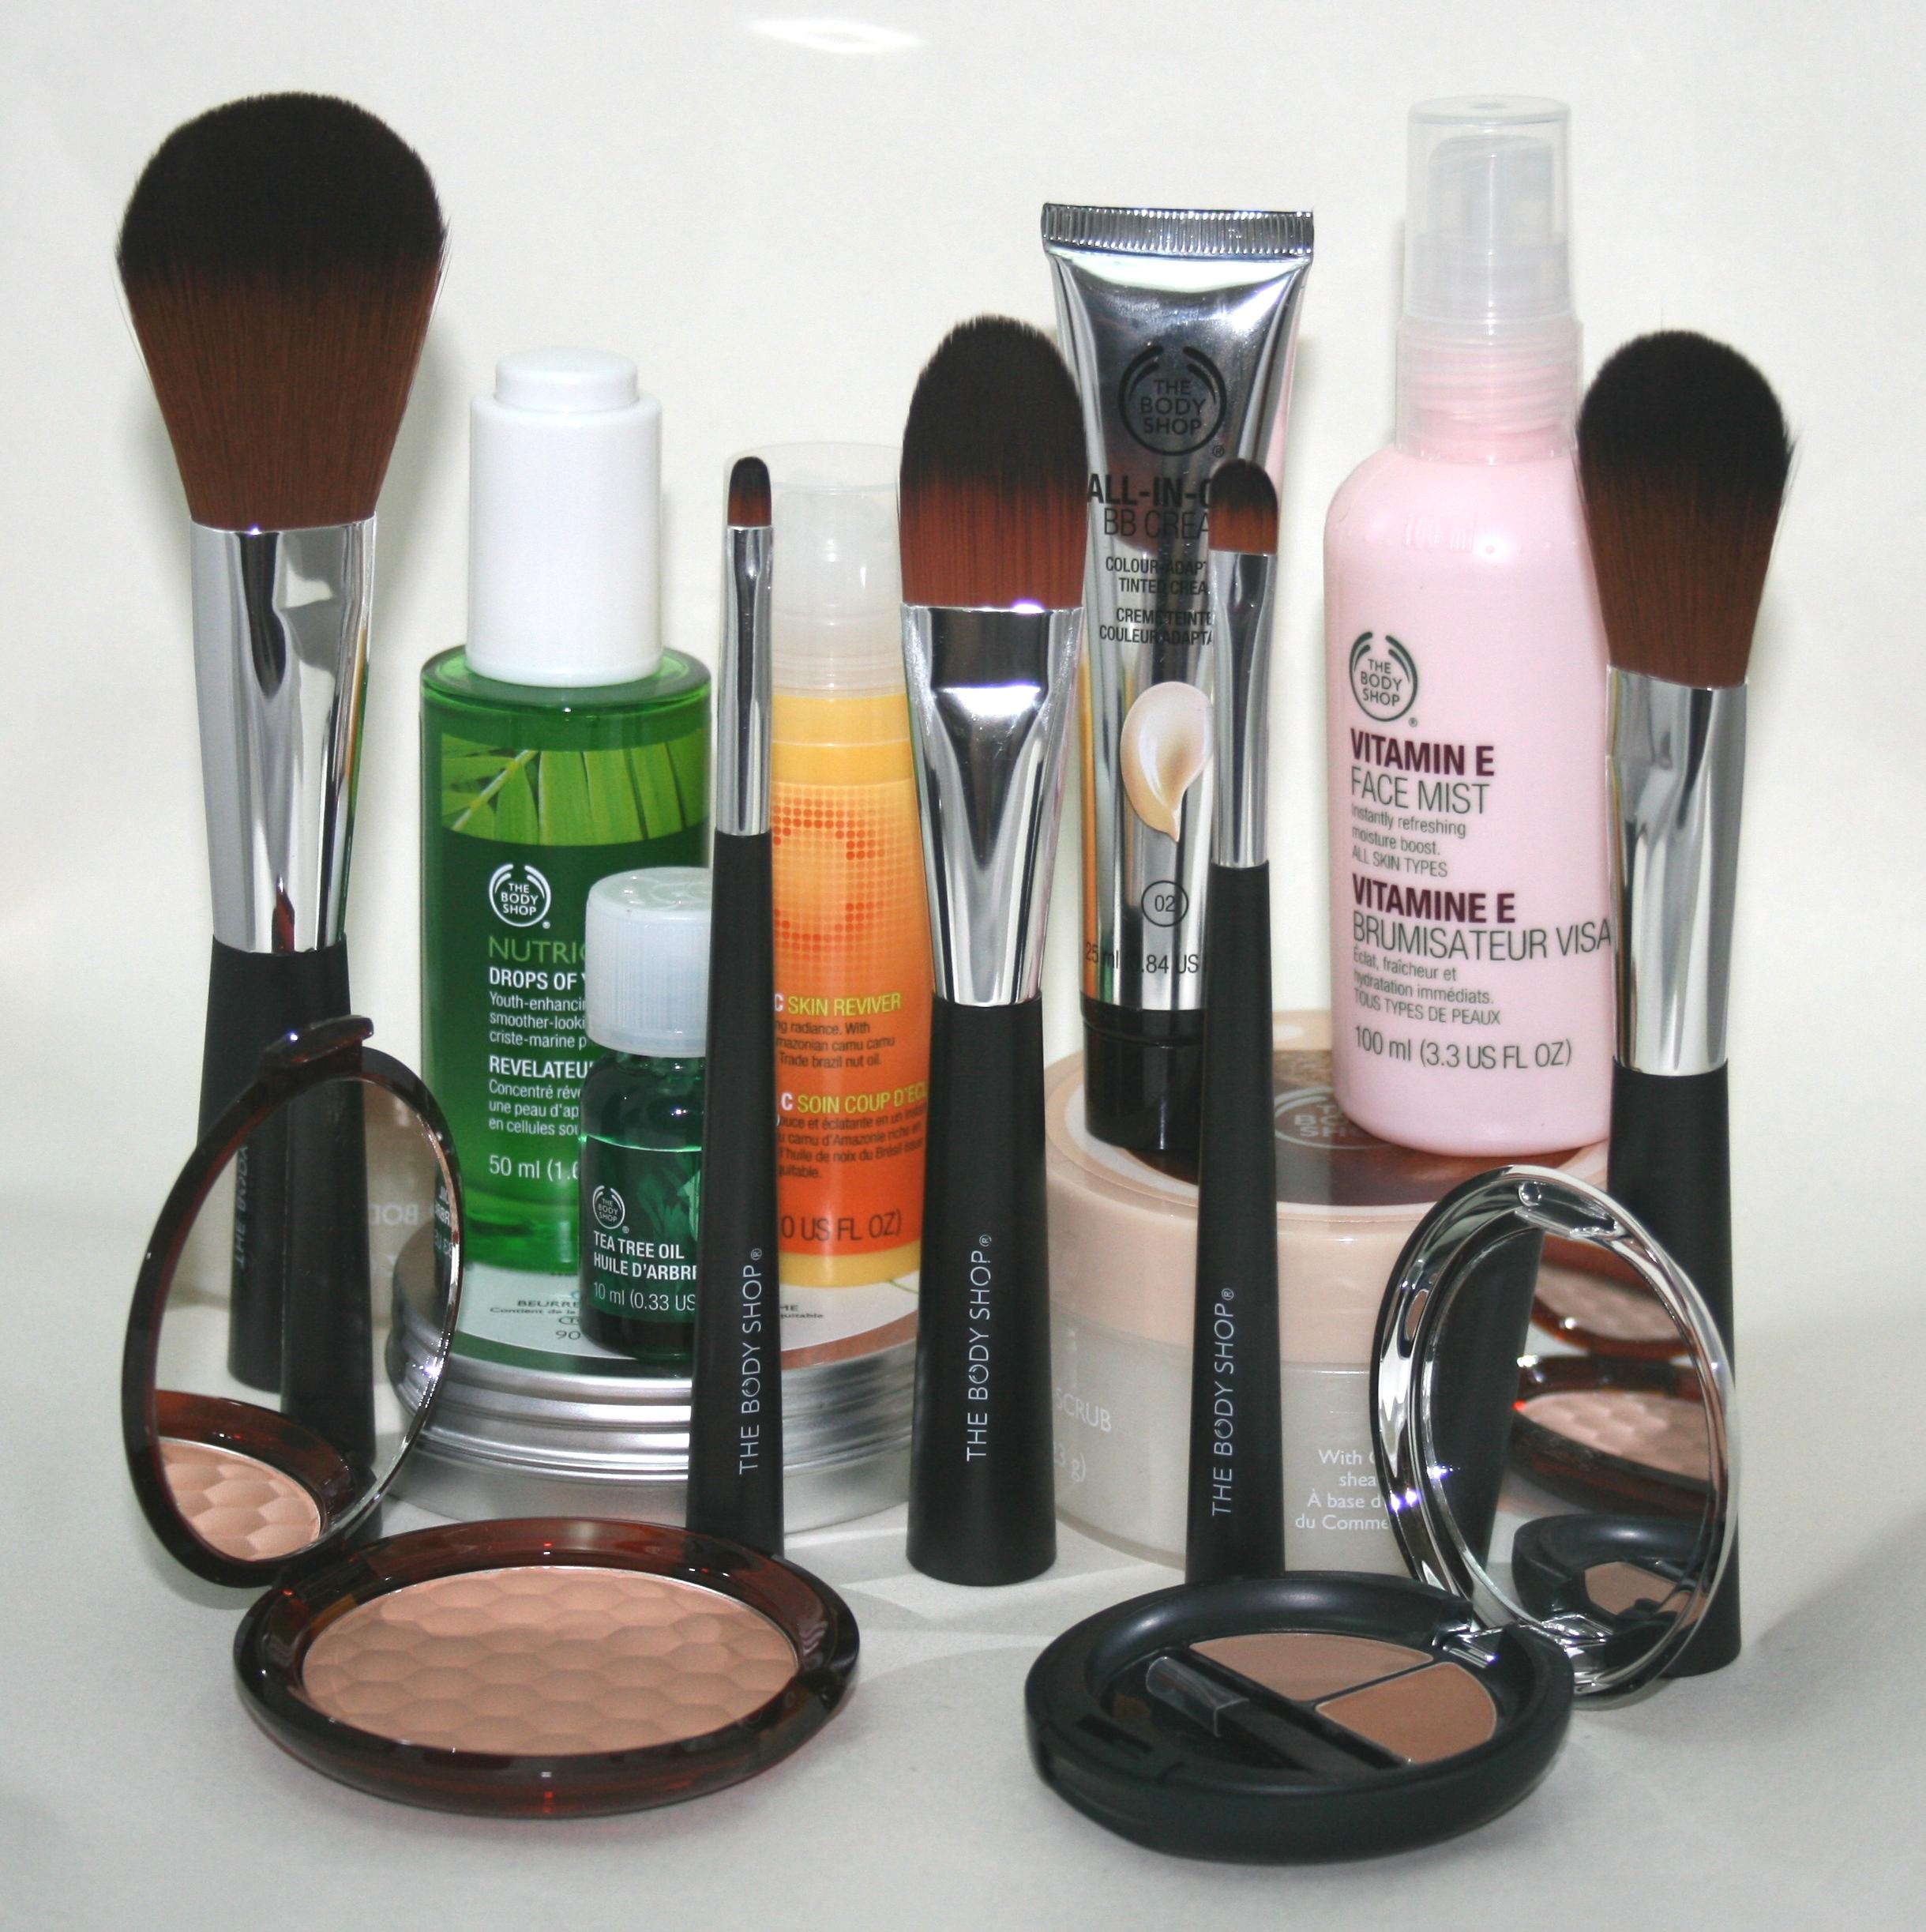 The Body Shop Best Makeup Finds: The Body Shop Beauty Gems